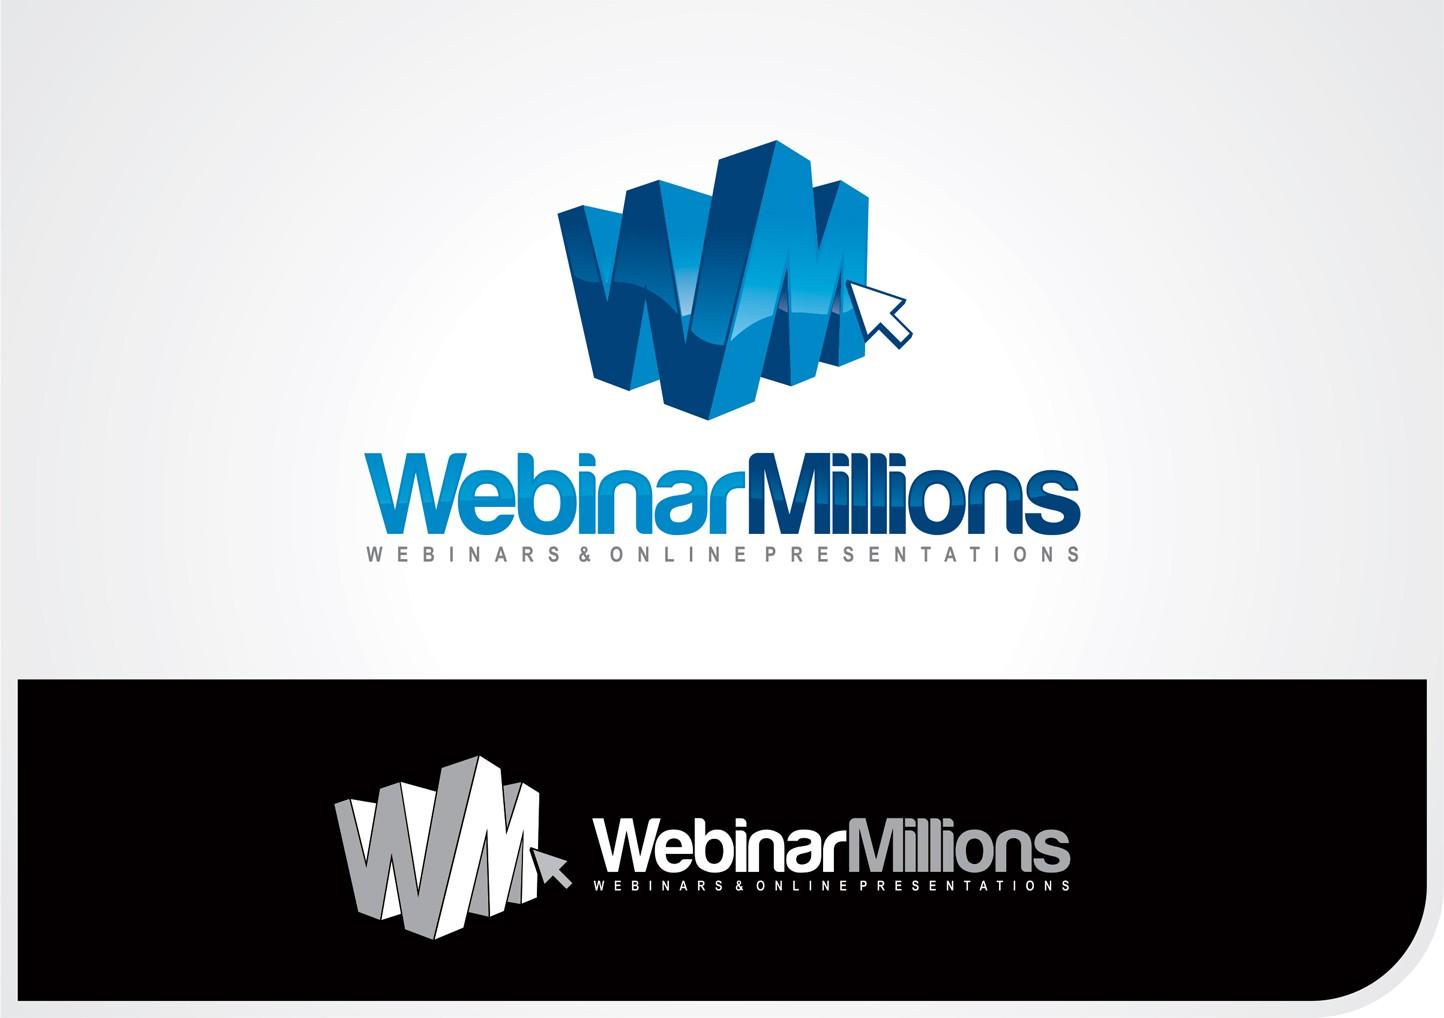 Webinar Millions needs a new logo